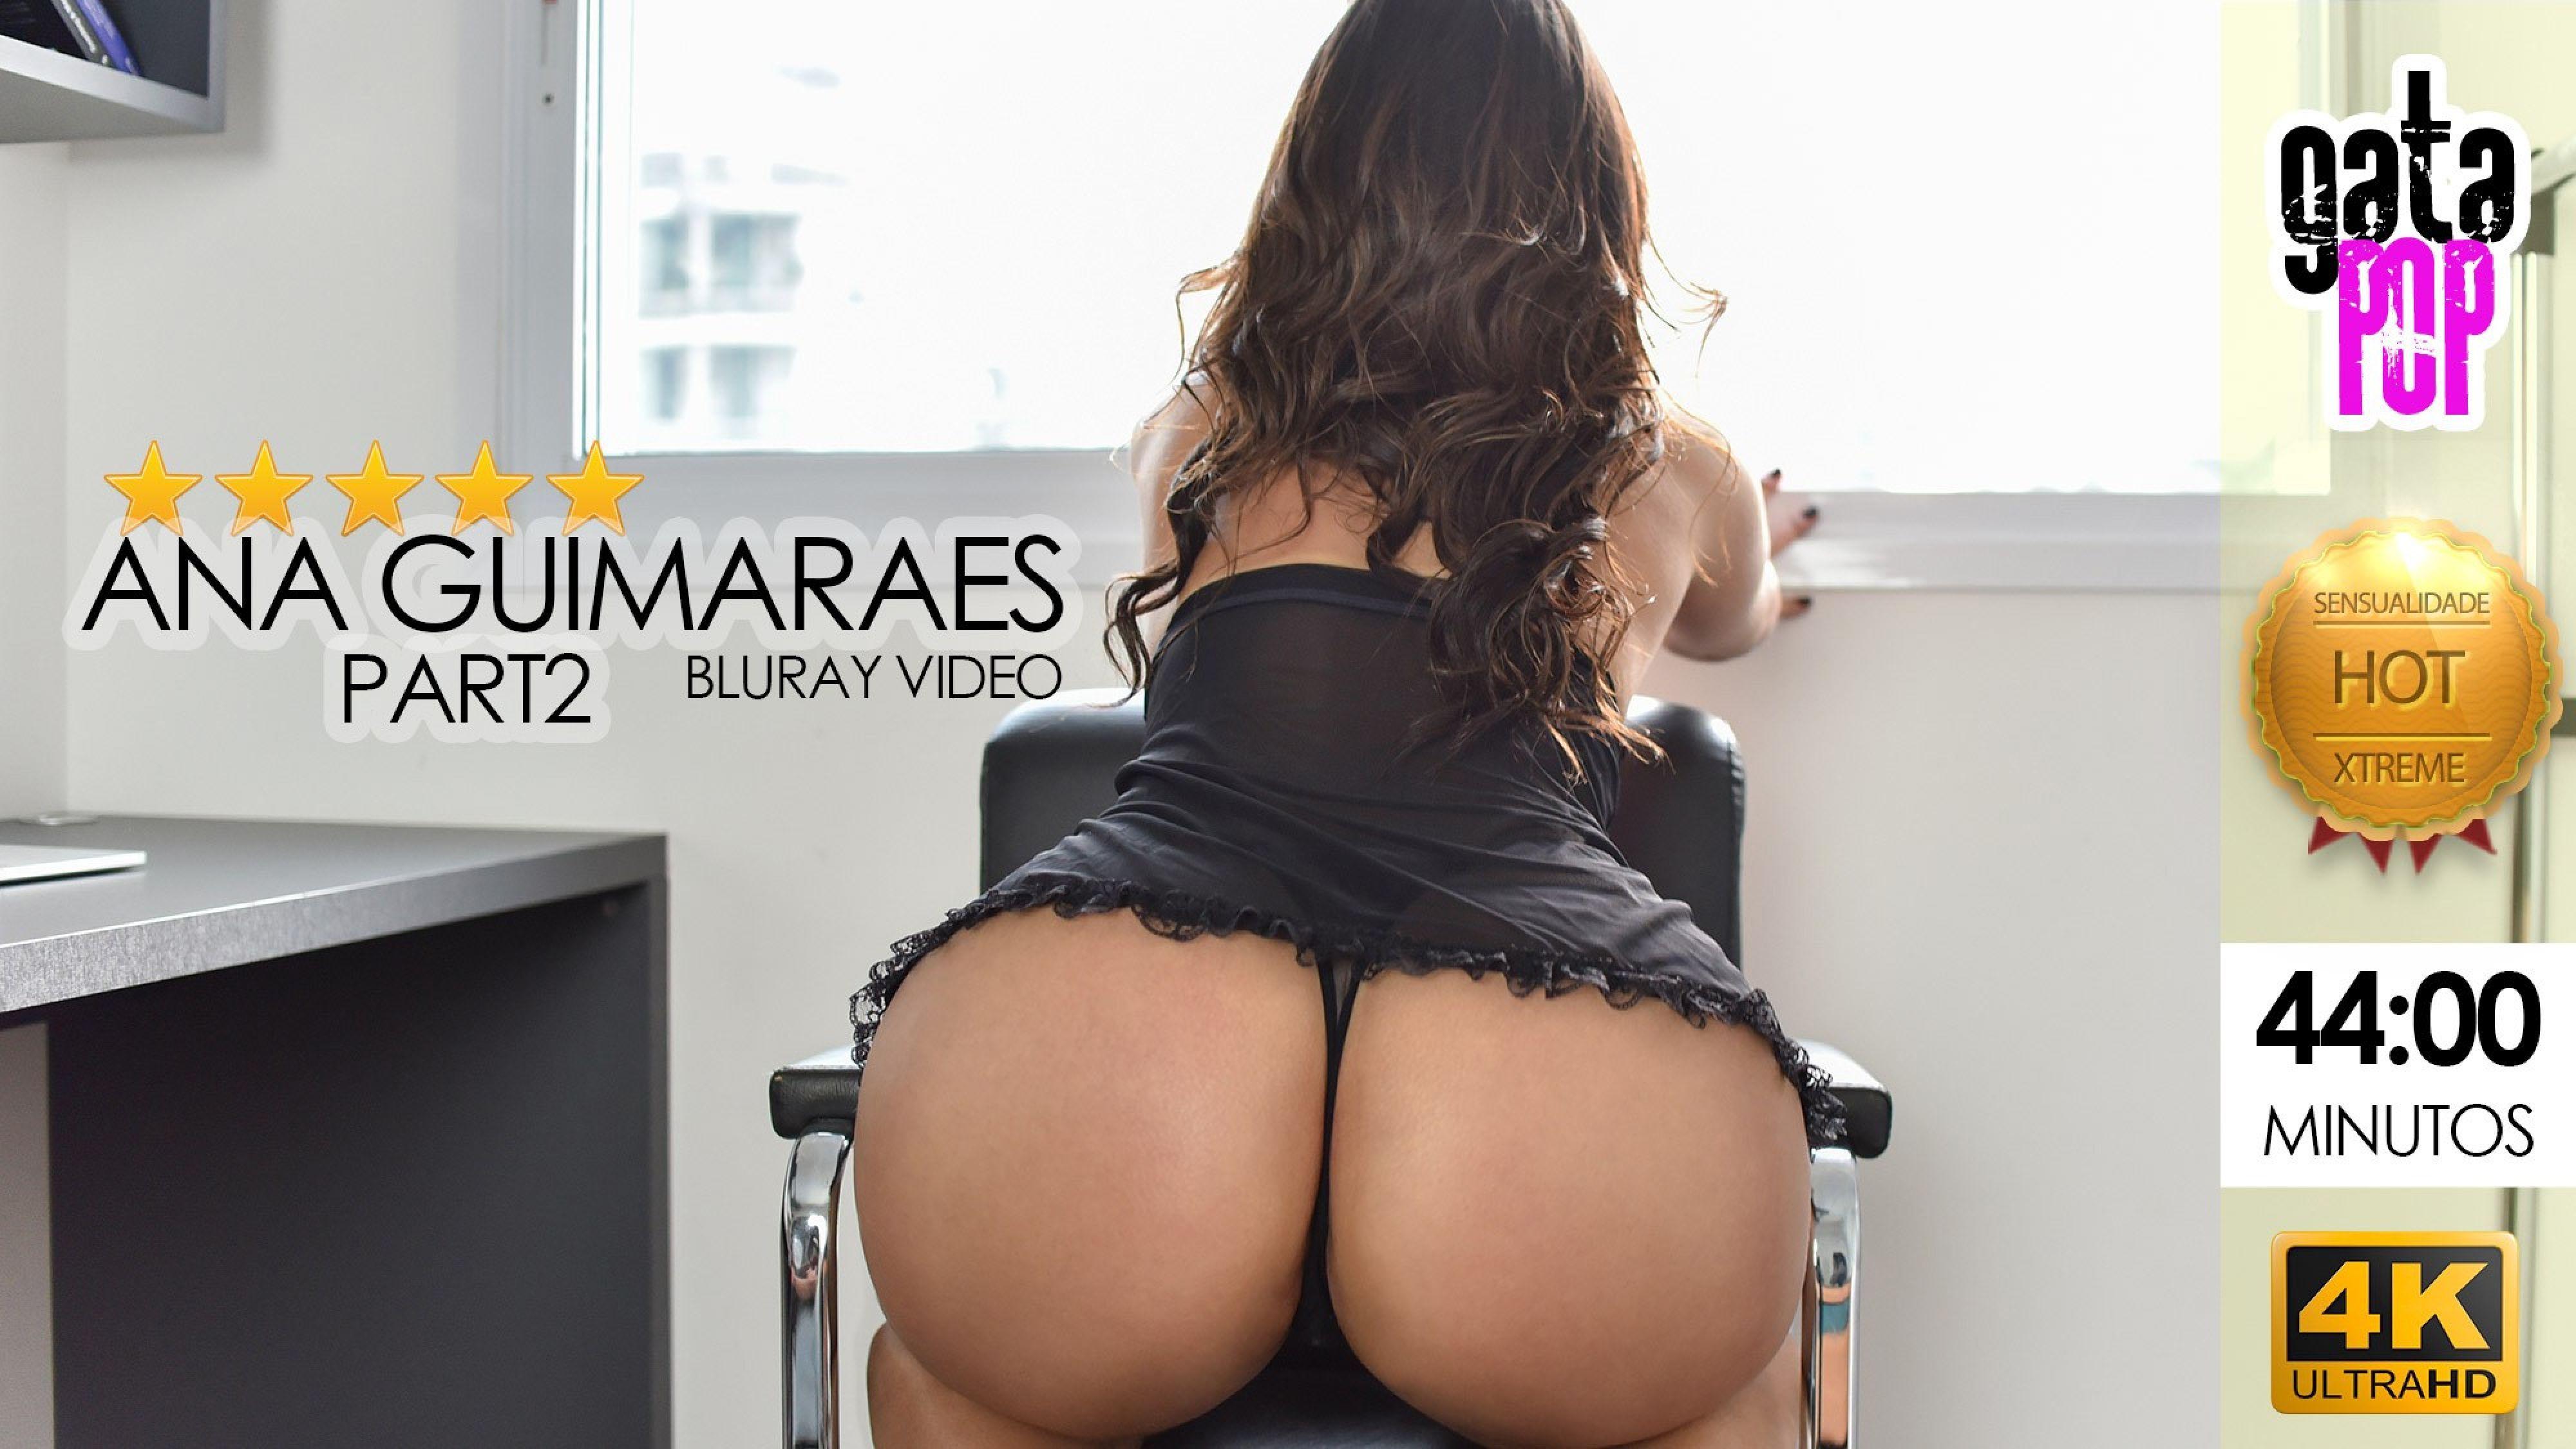 Ana Guimaraes 2 - Especial BumBum